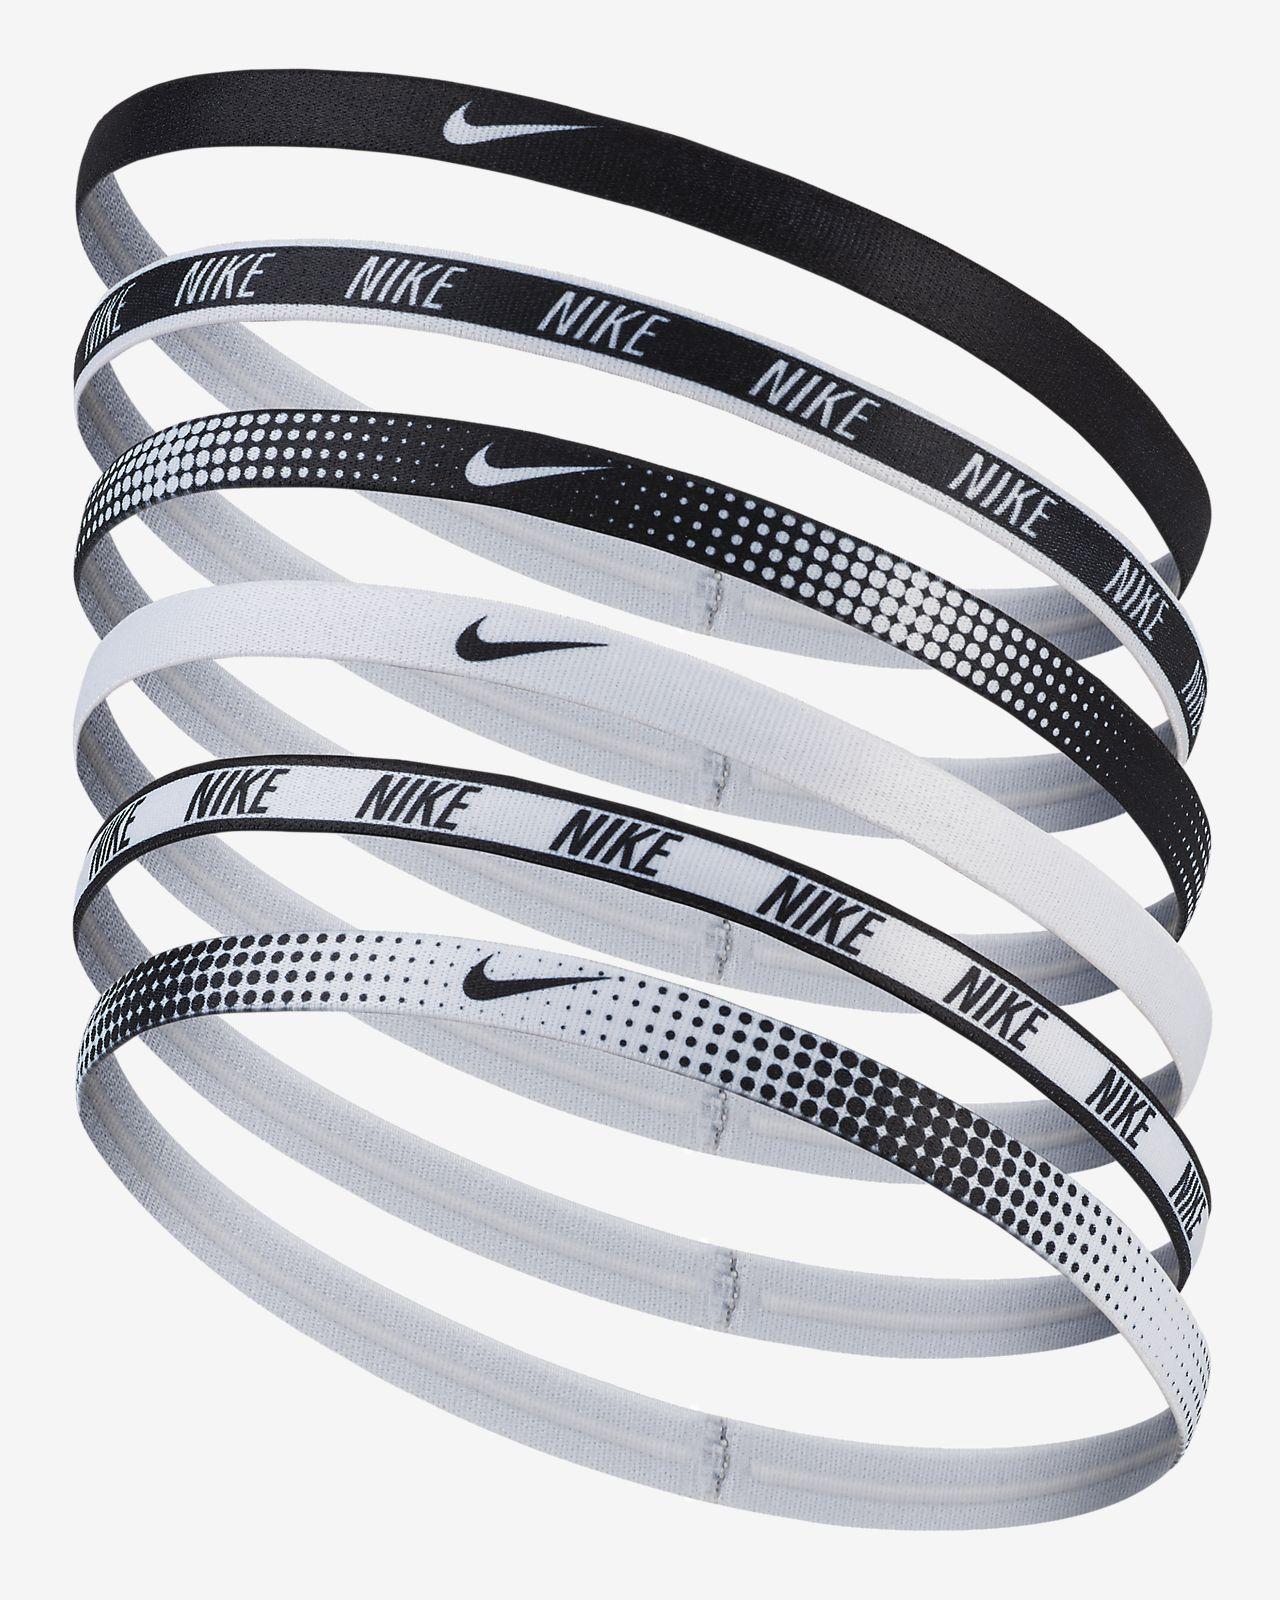 Nike Printed Headbands (6 Pack). Nike.com GB 3c66be7d85c